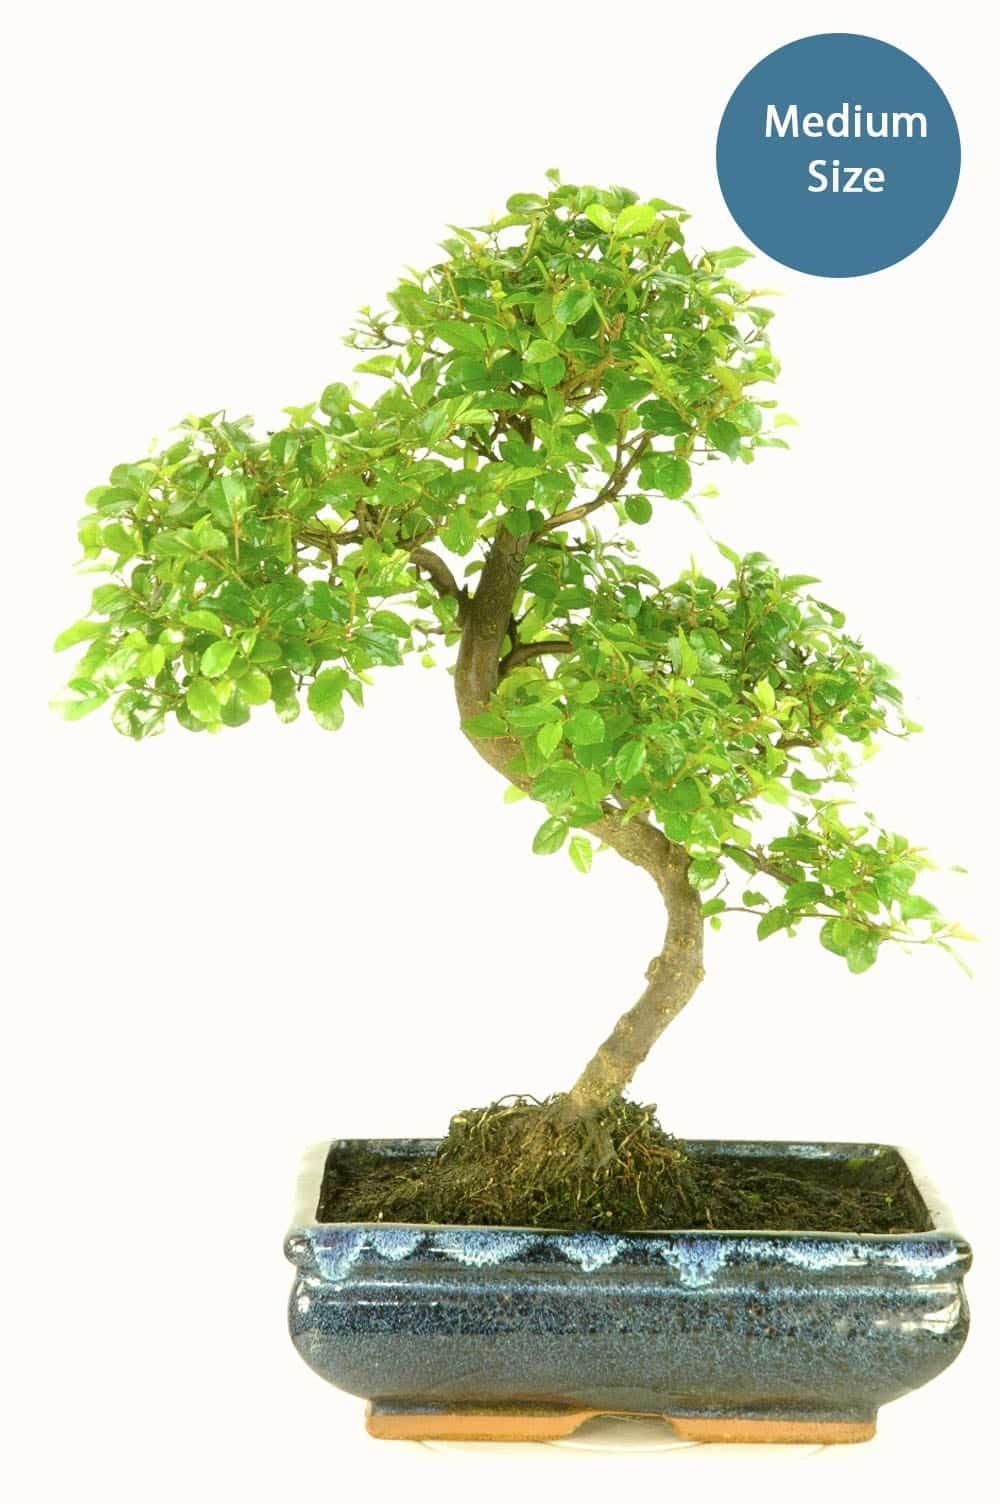 Medium sized fruiting Sweet Plum bosnai for bonsai tree kit builder